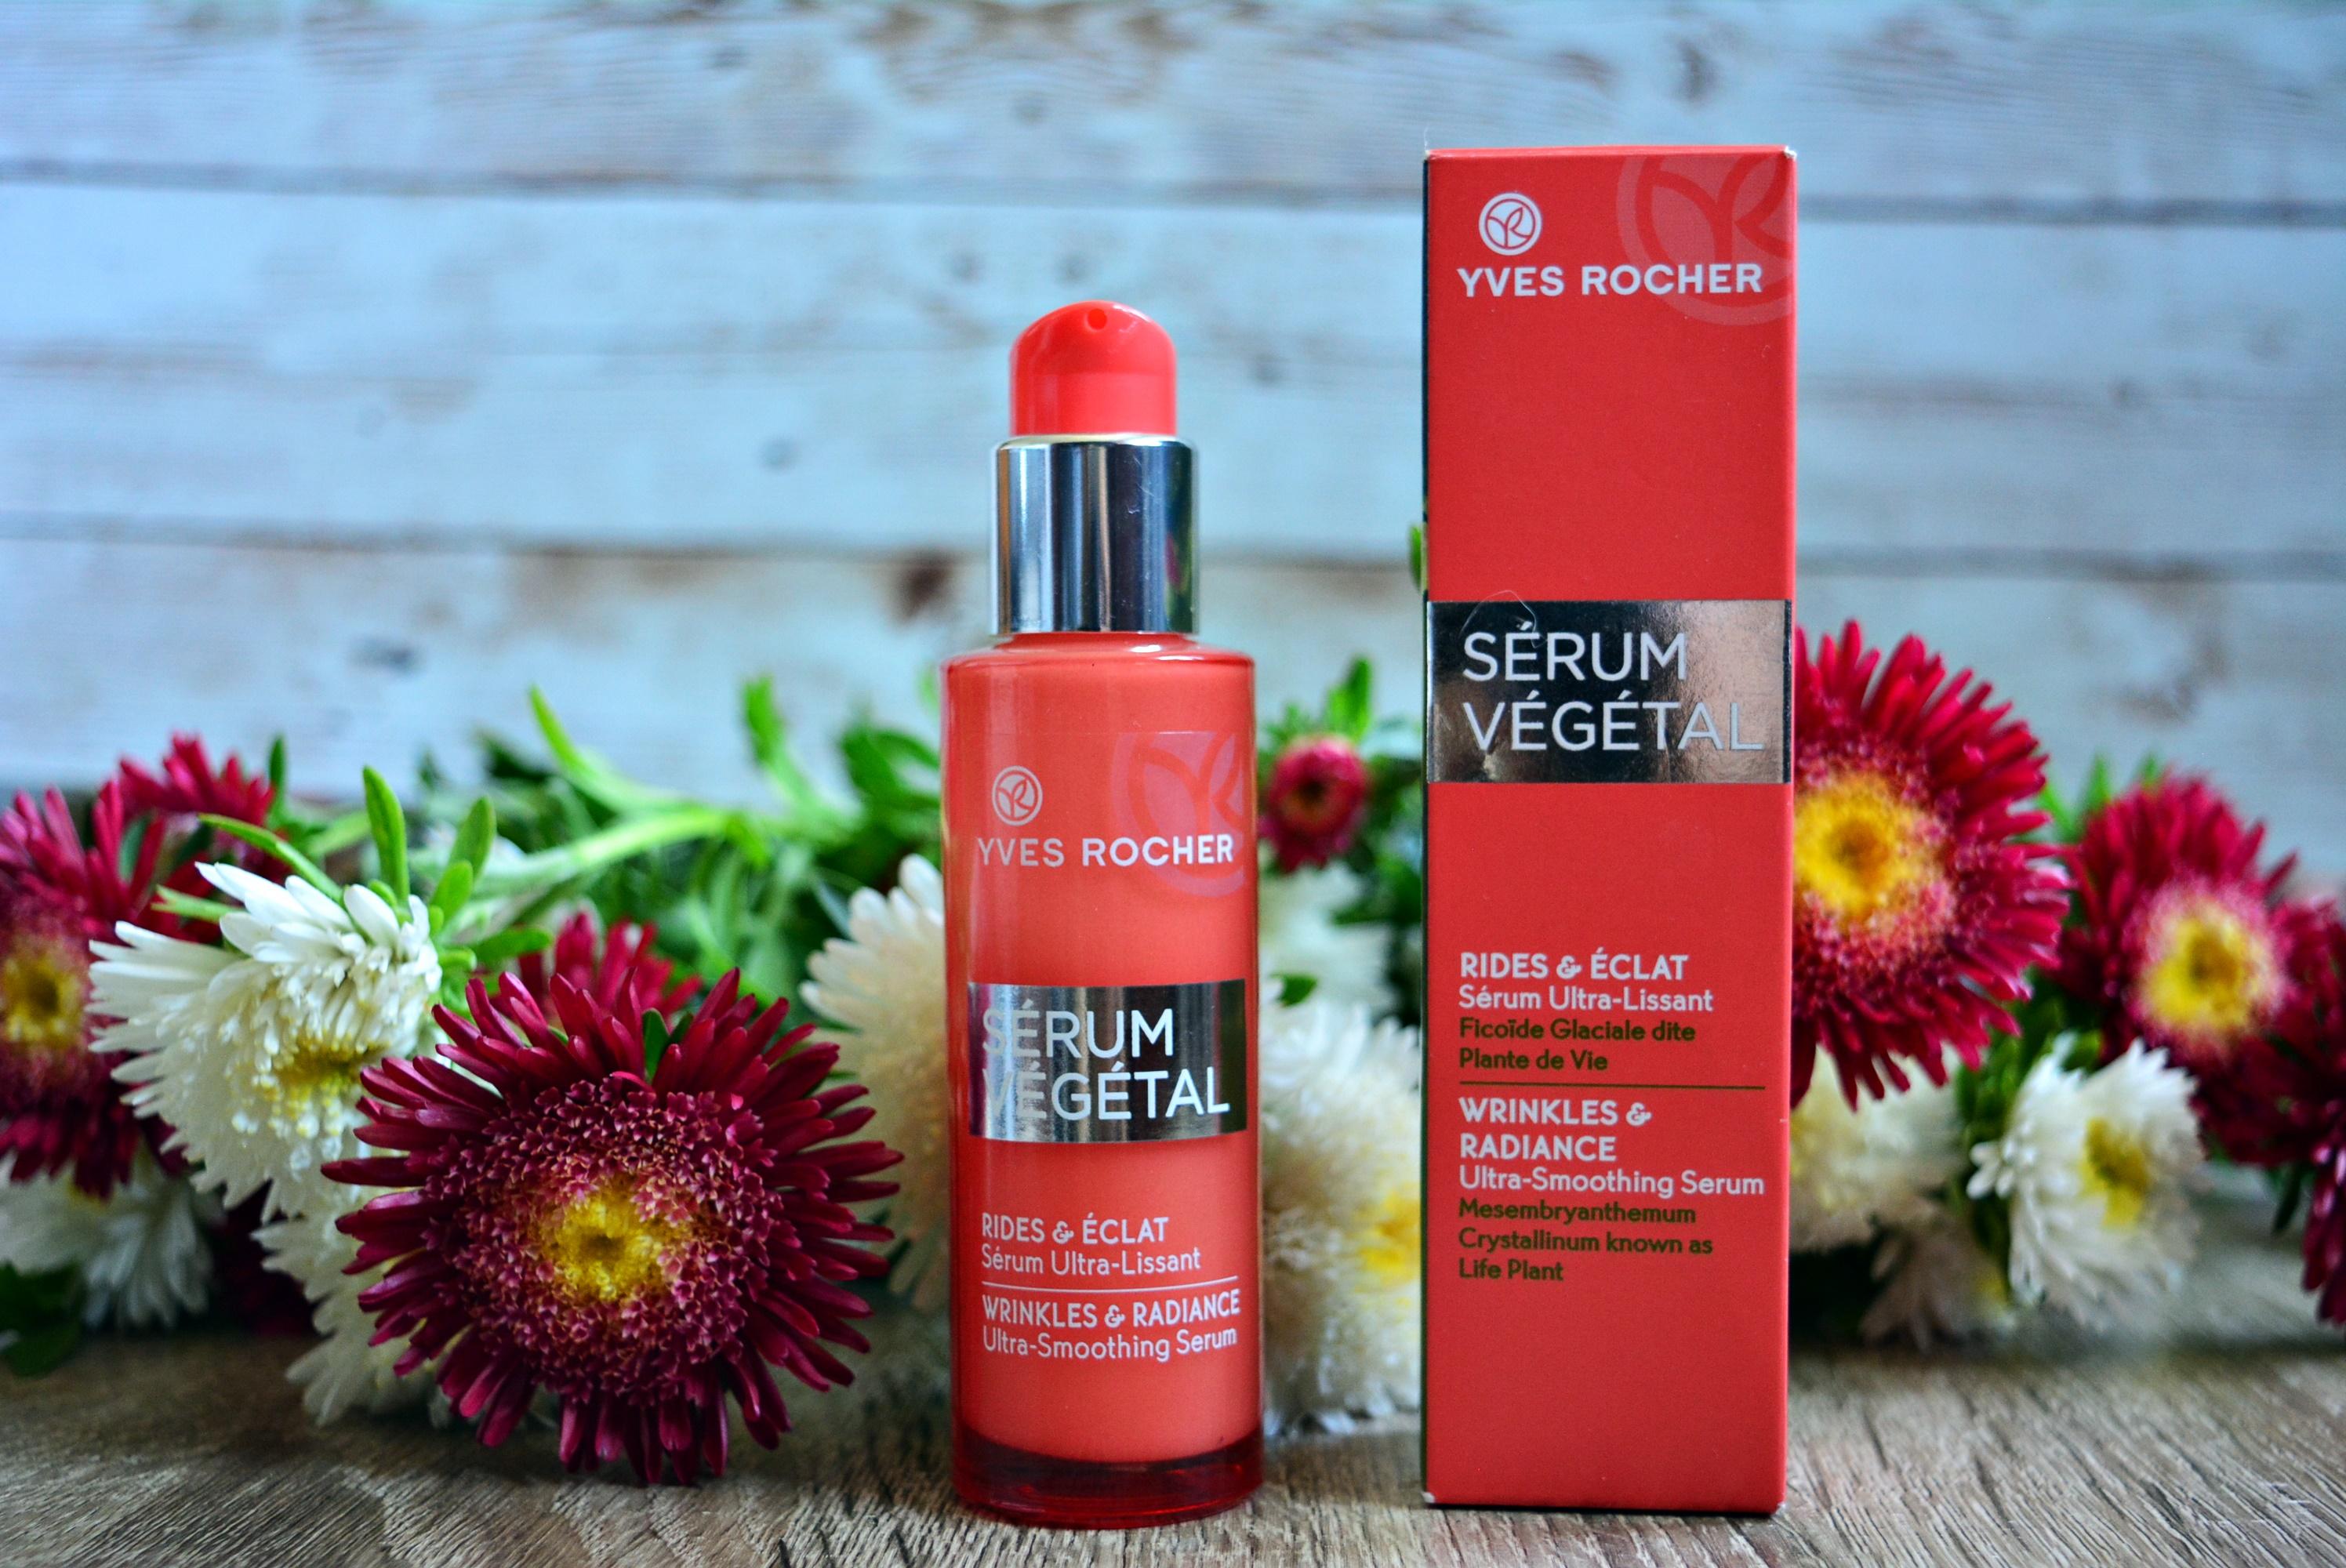 Yves Rocher Serum Vegetal